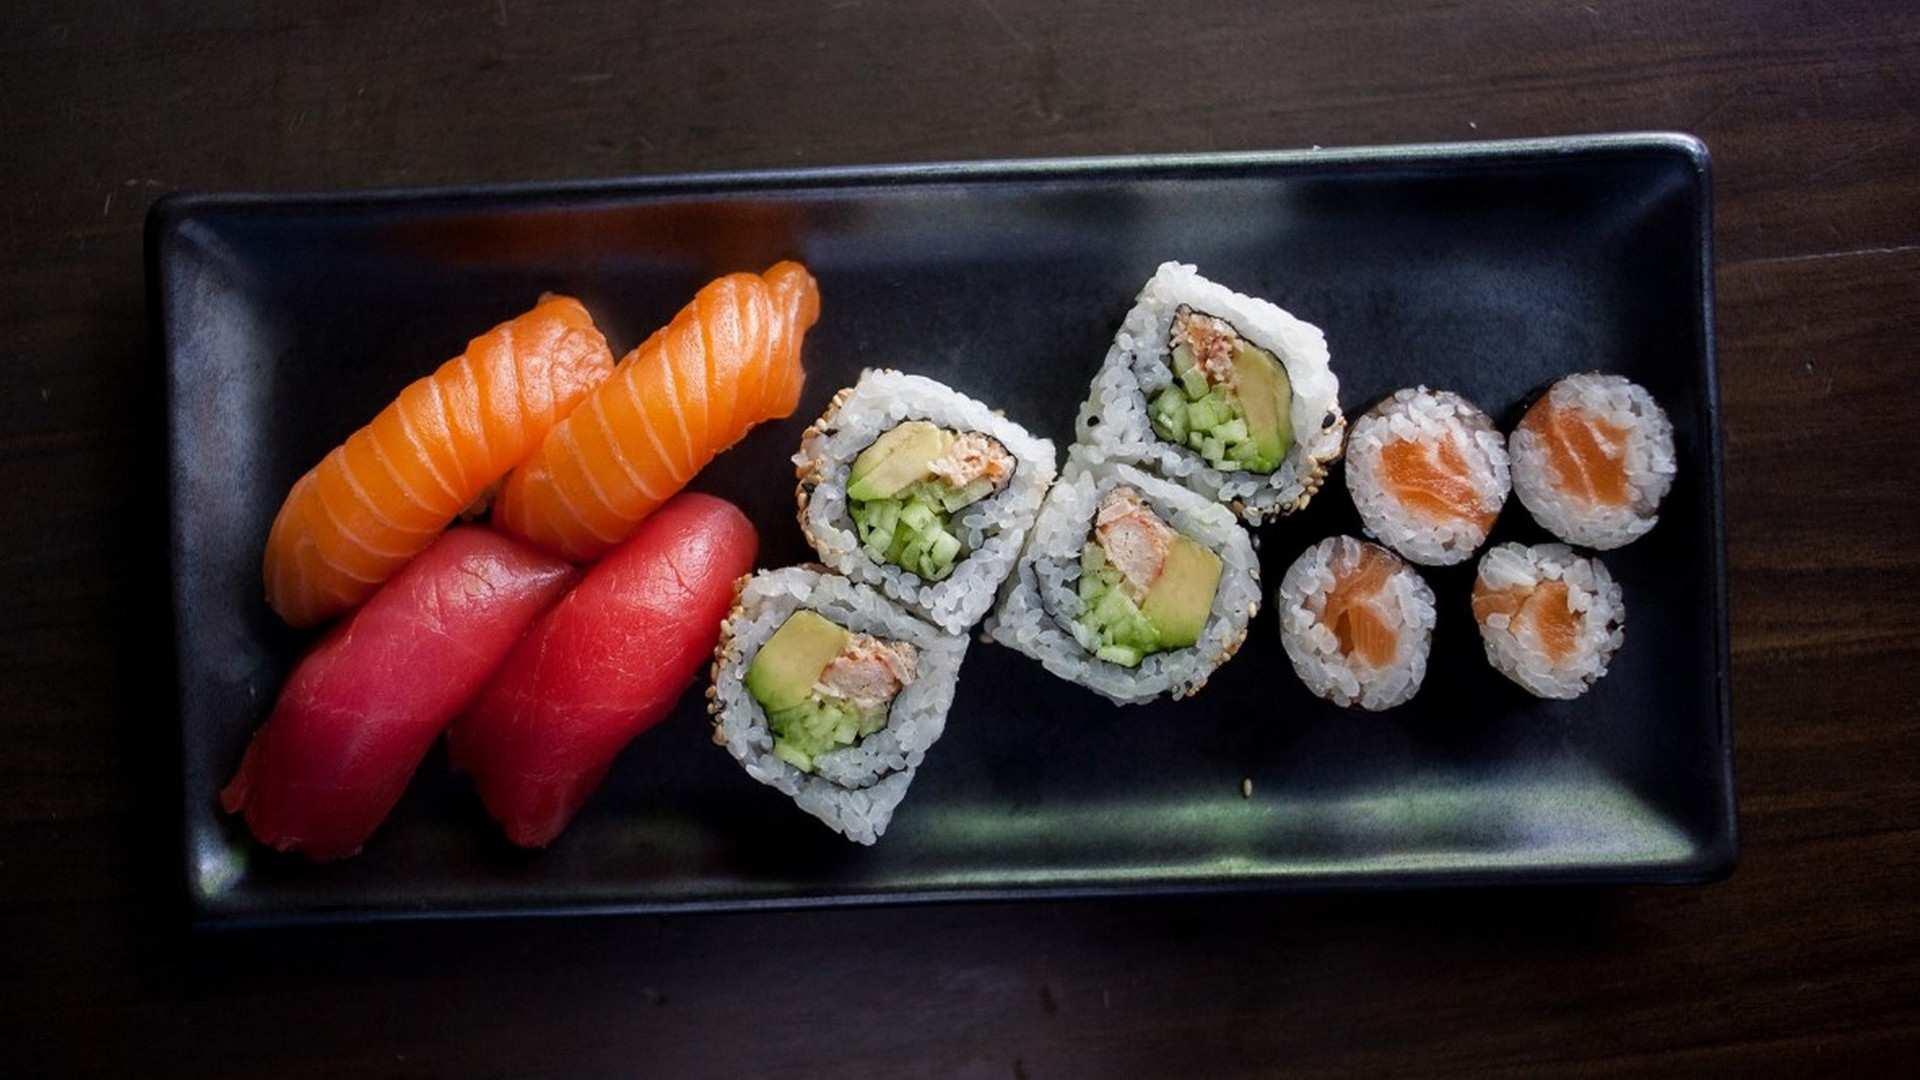 Casa sushi: Sashimis, nigiris, makis, uramakis... ¡a domicilio!